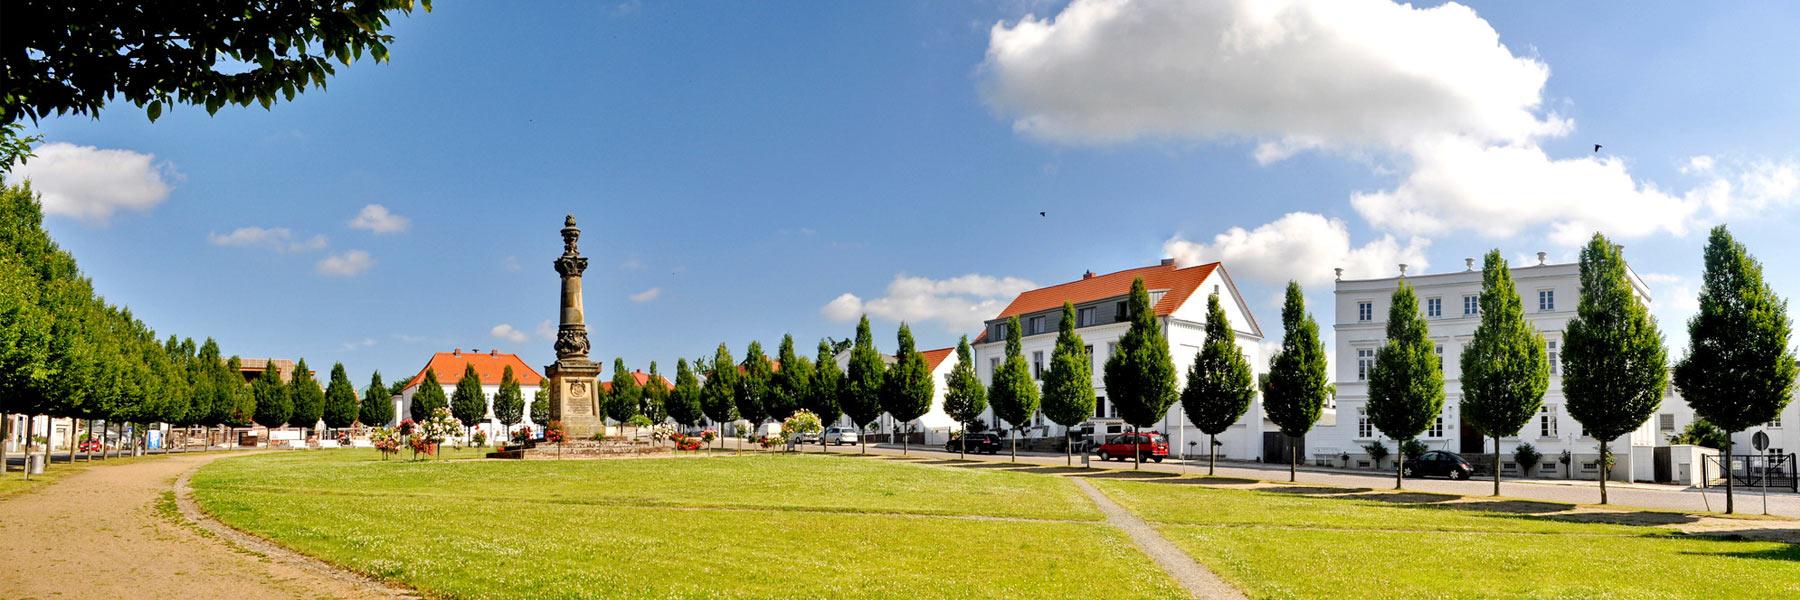 Circus Putbus Kriegerdenkmal - Putbus